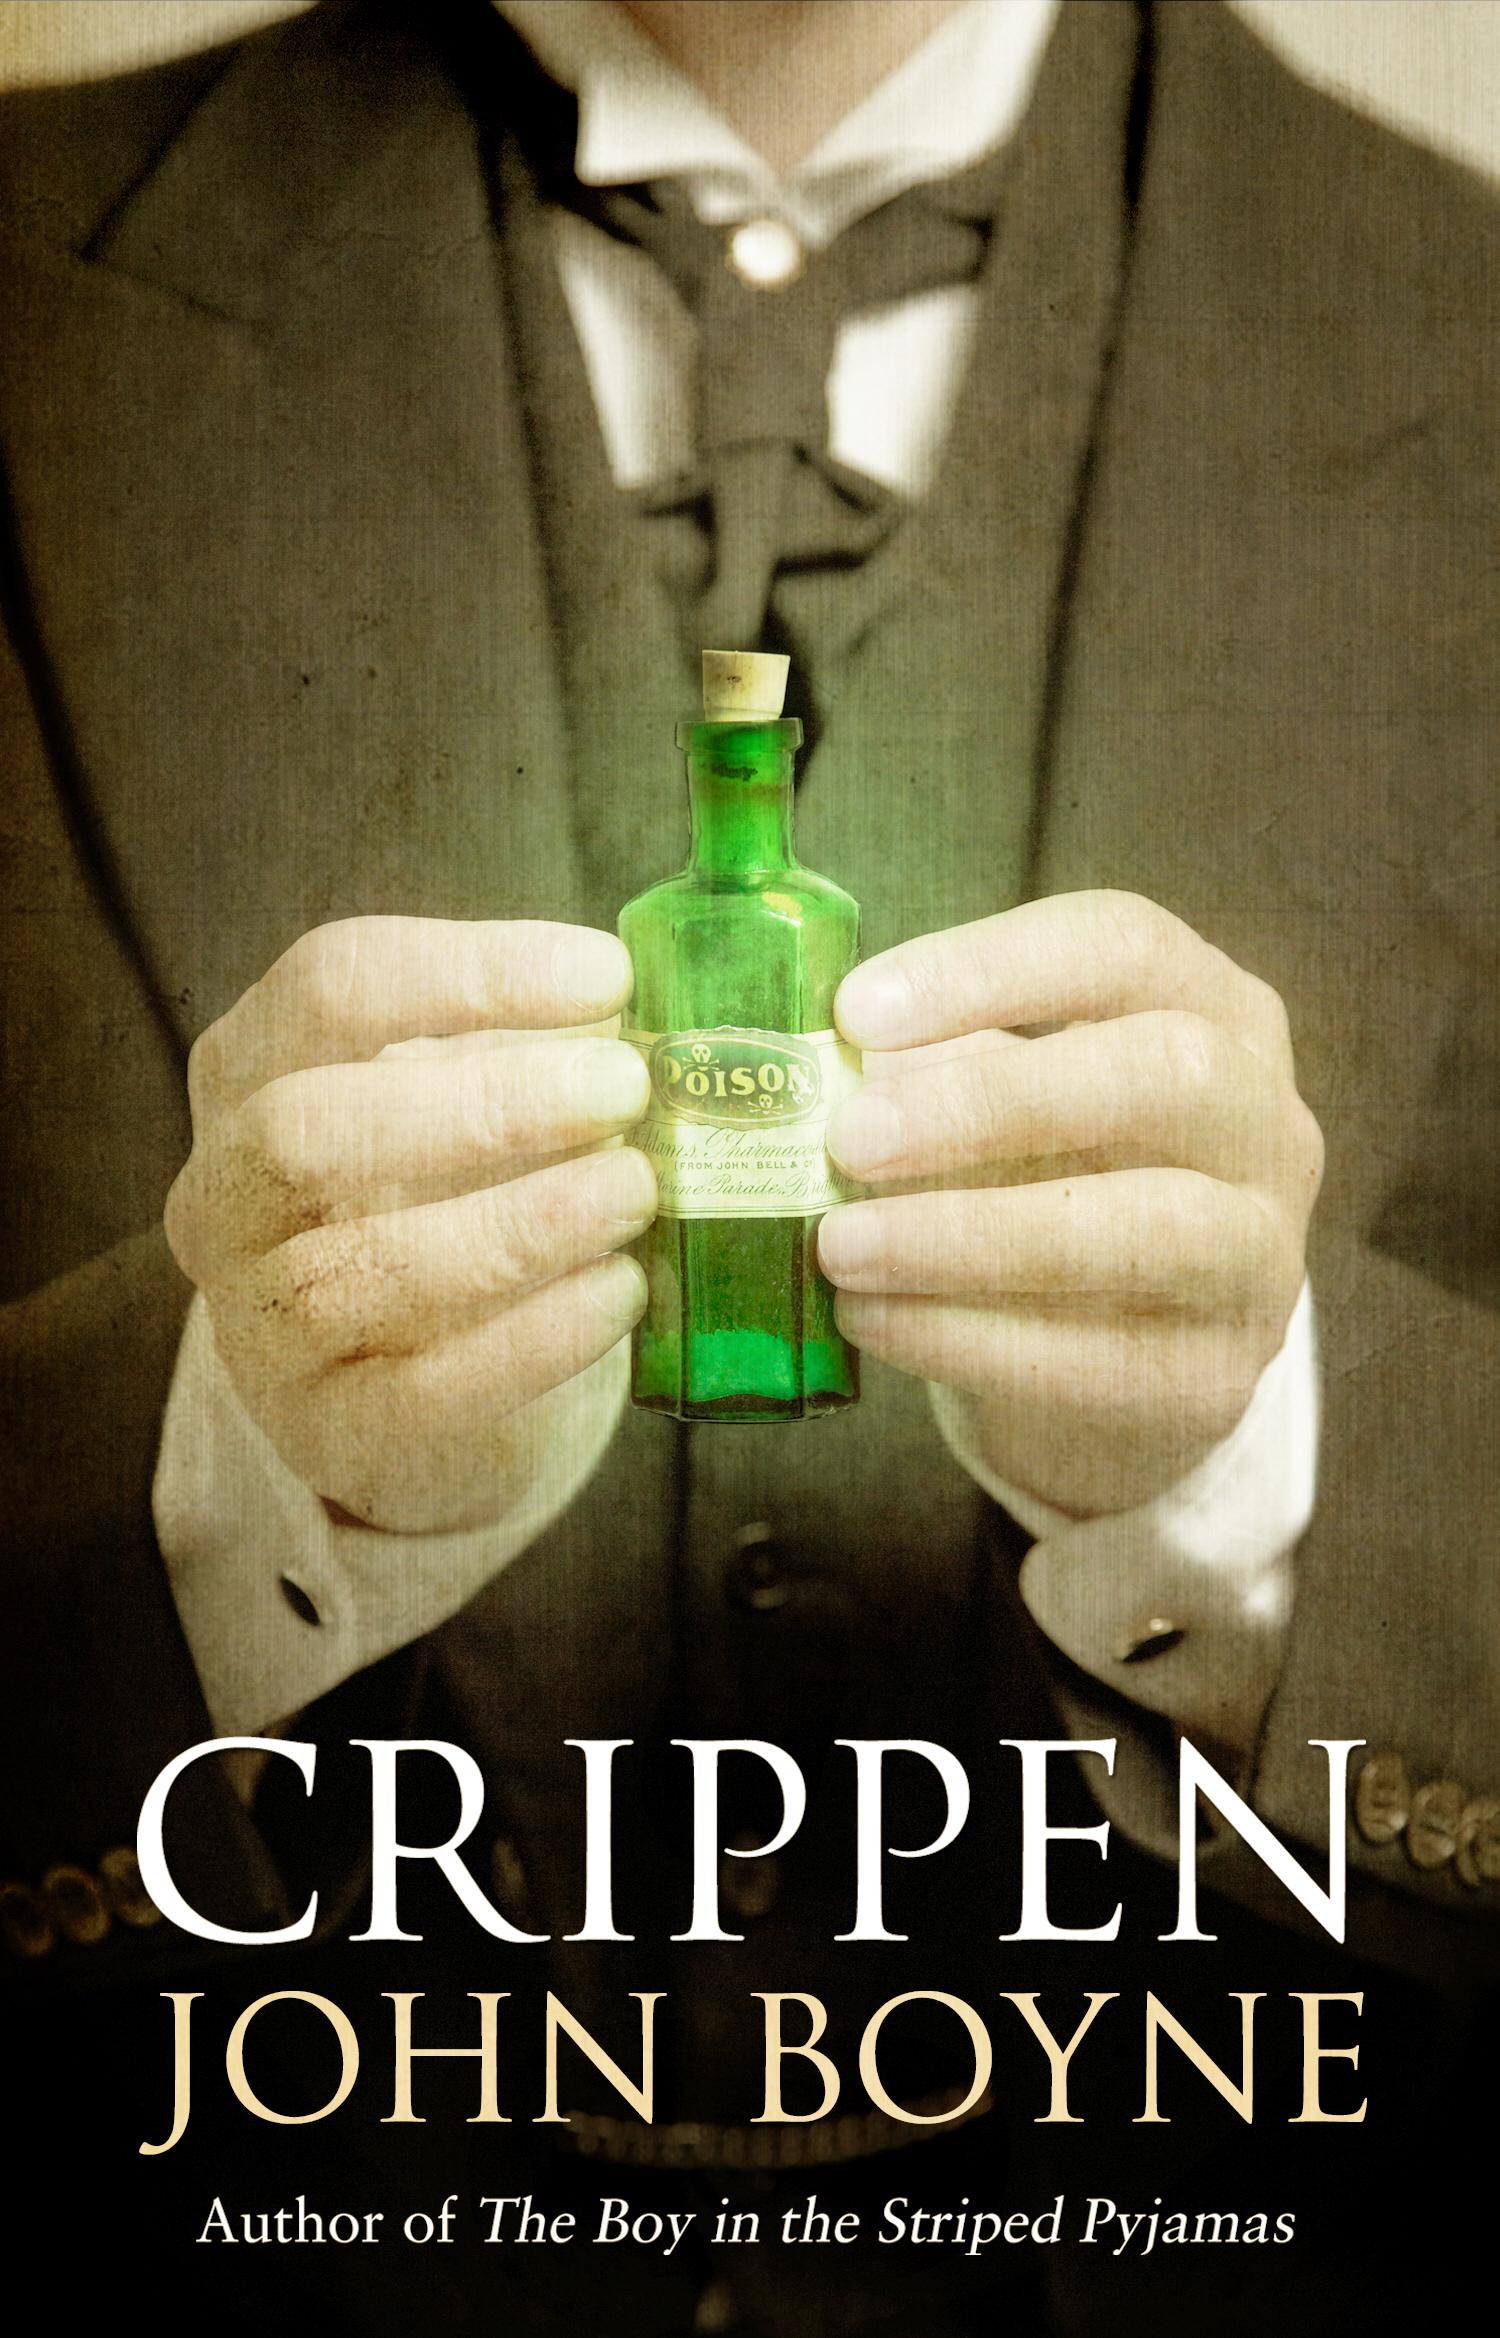 biography john boyne crippen